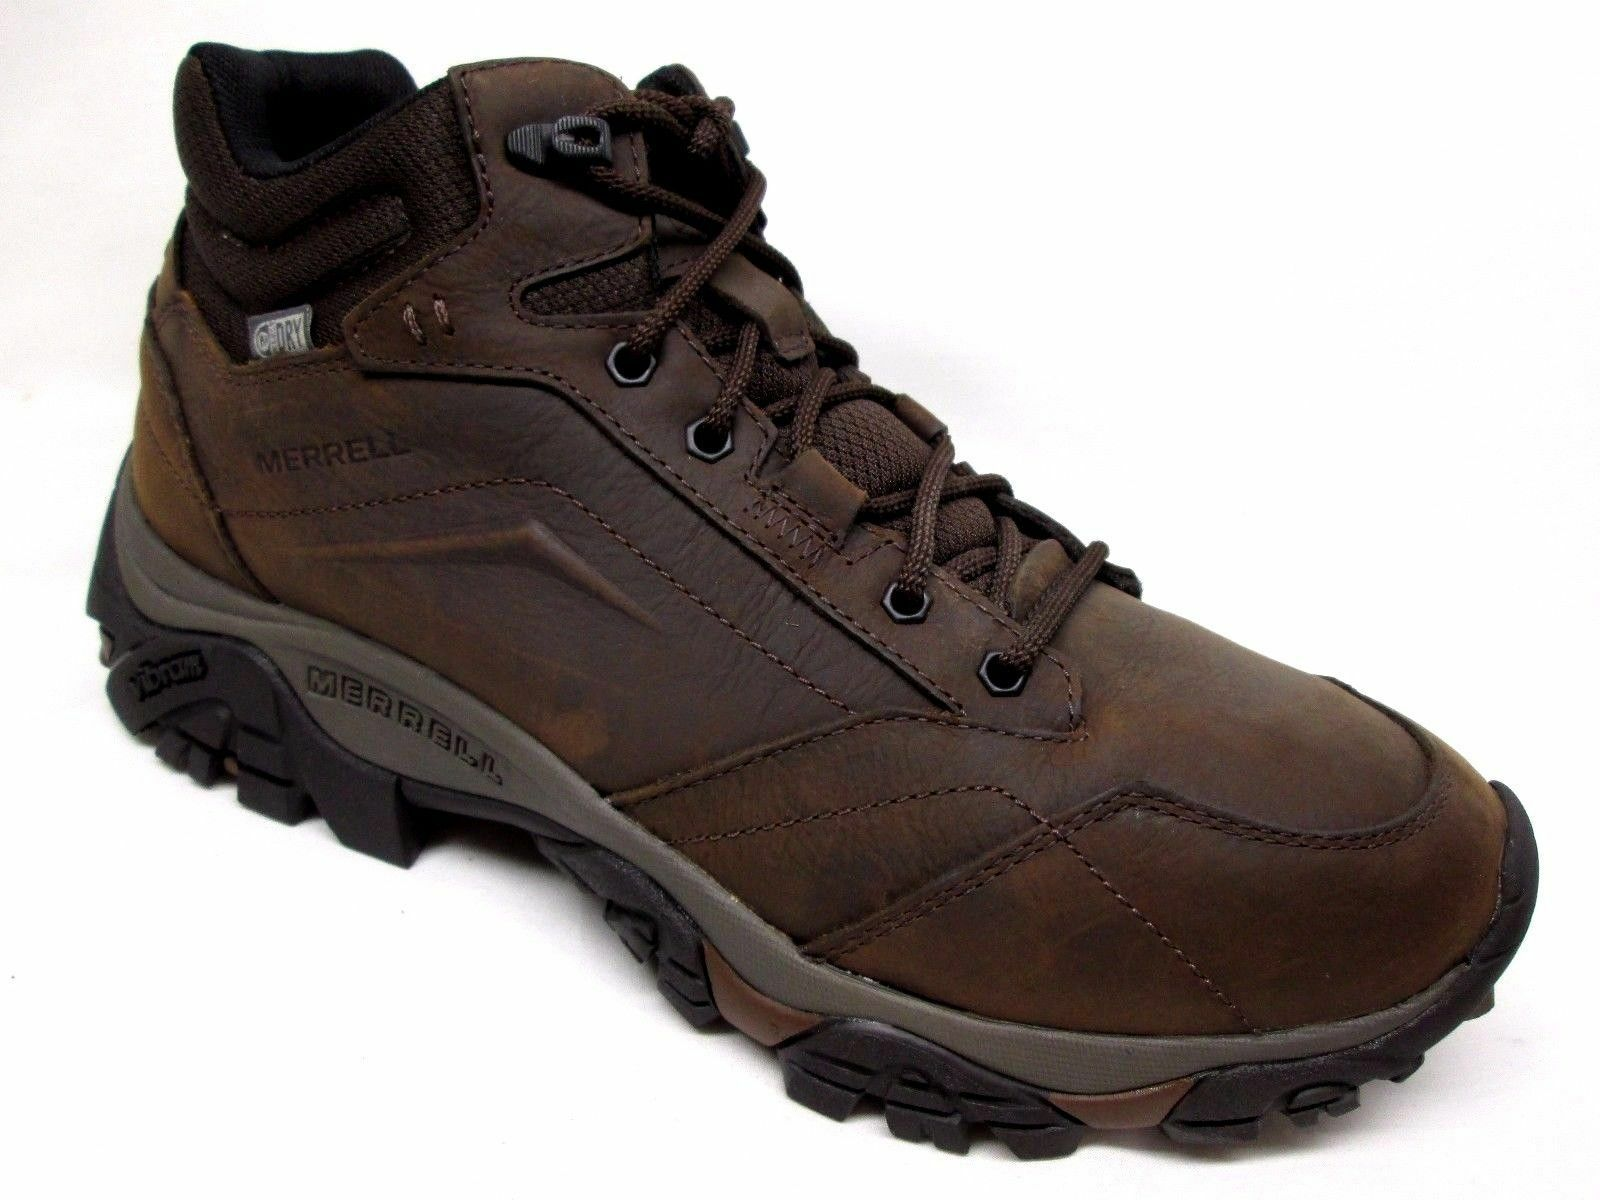 Merrell Moab Adventure Waterproof Hiking Boots Mens Dark Earth J91819 Size 9.5 M